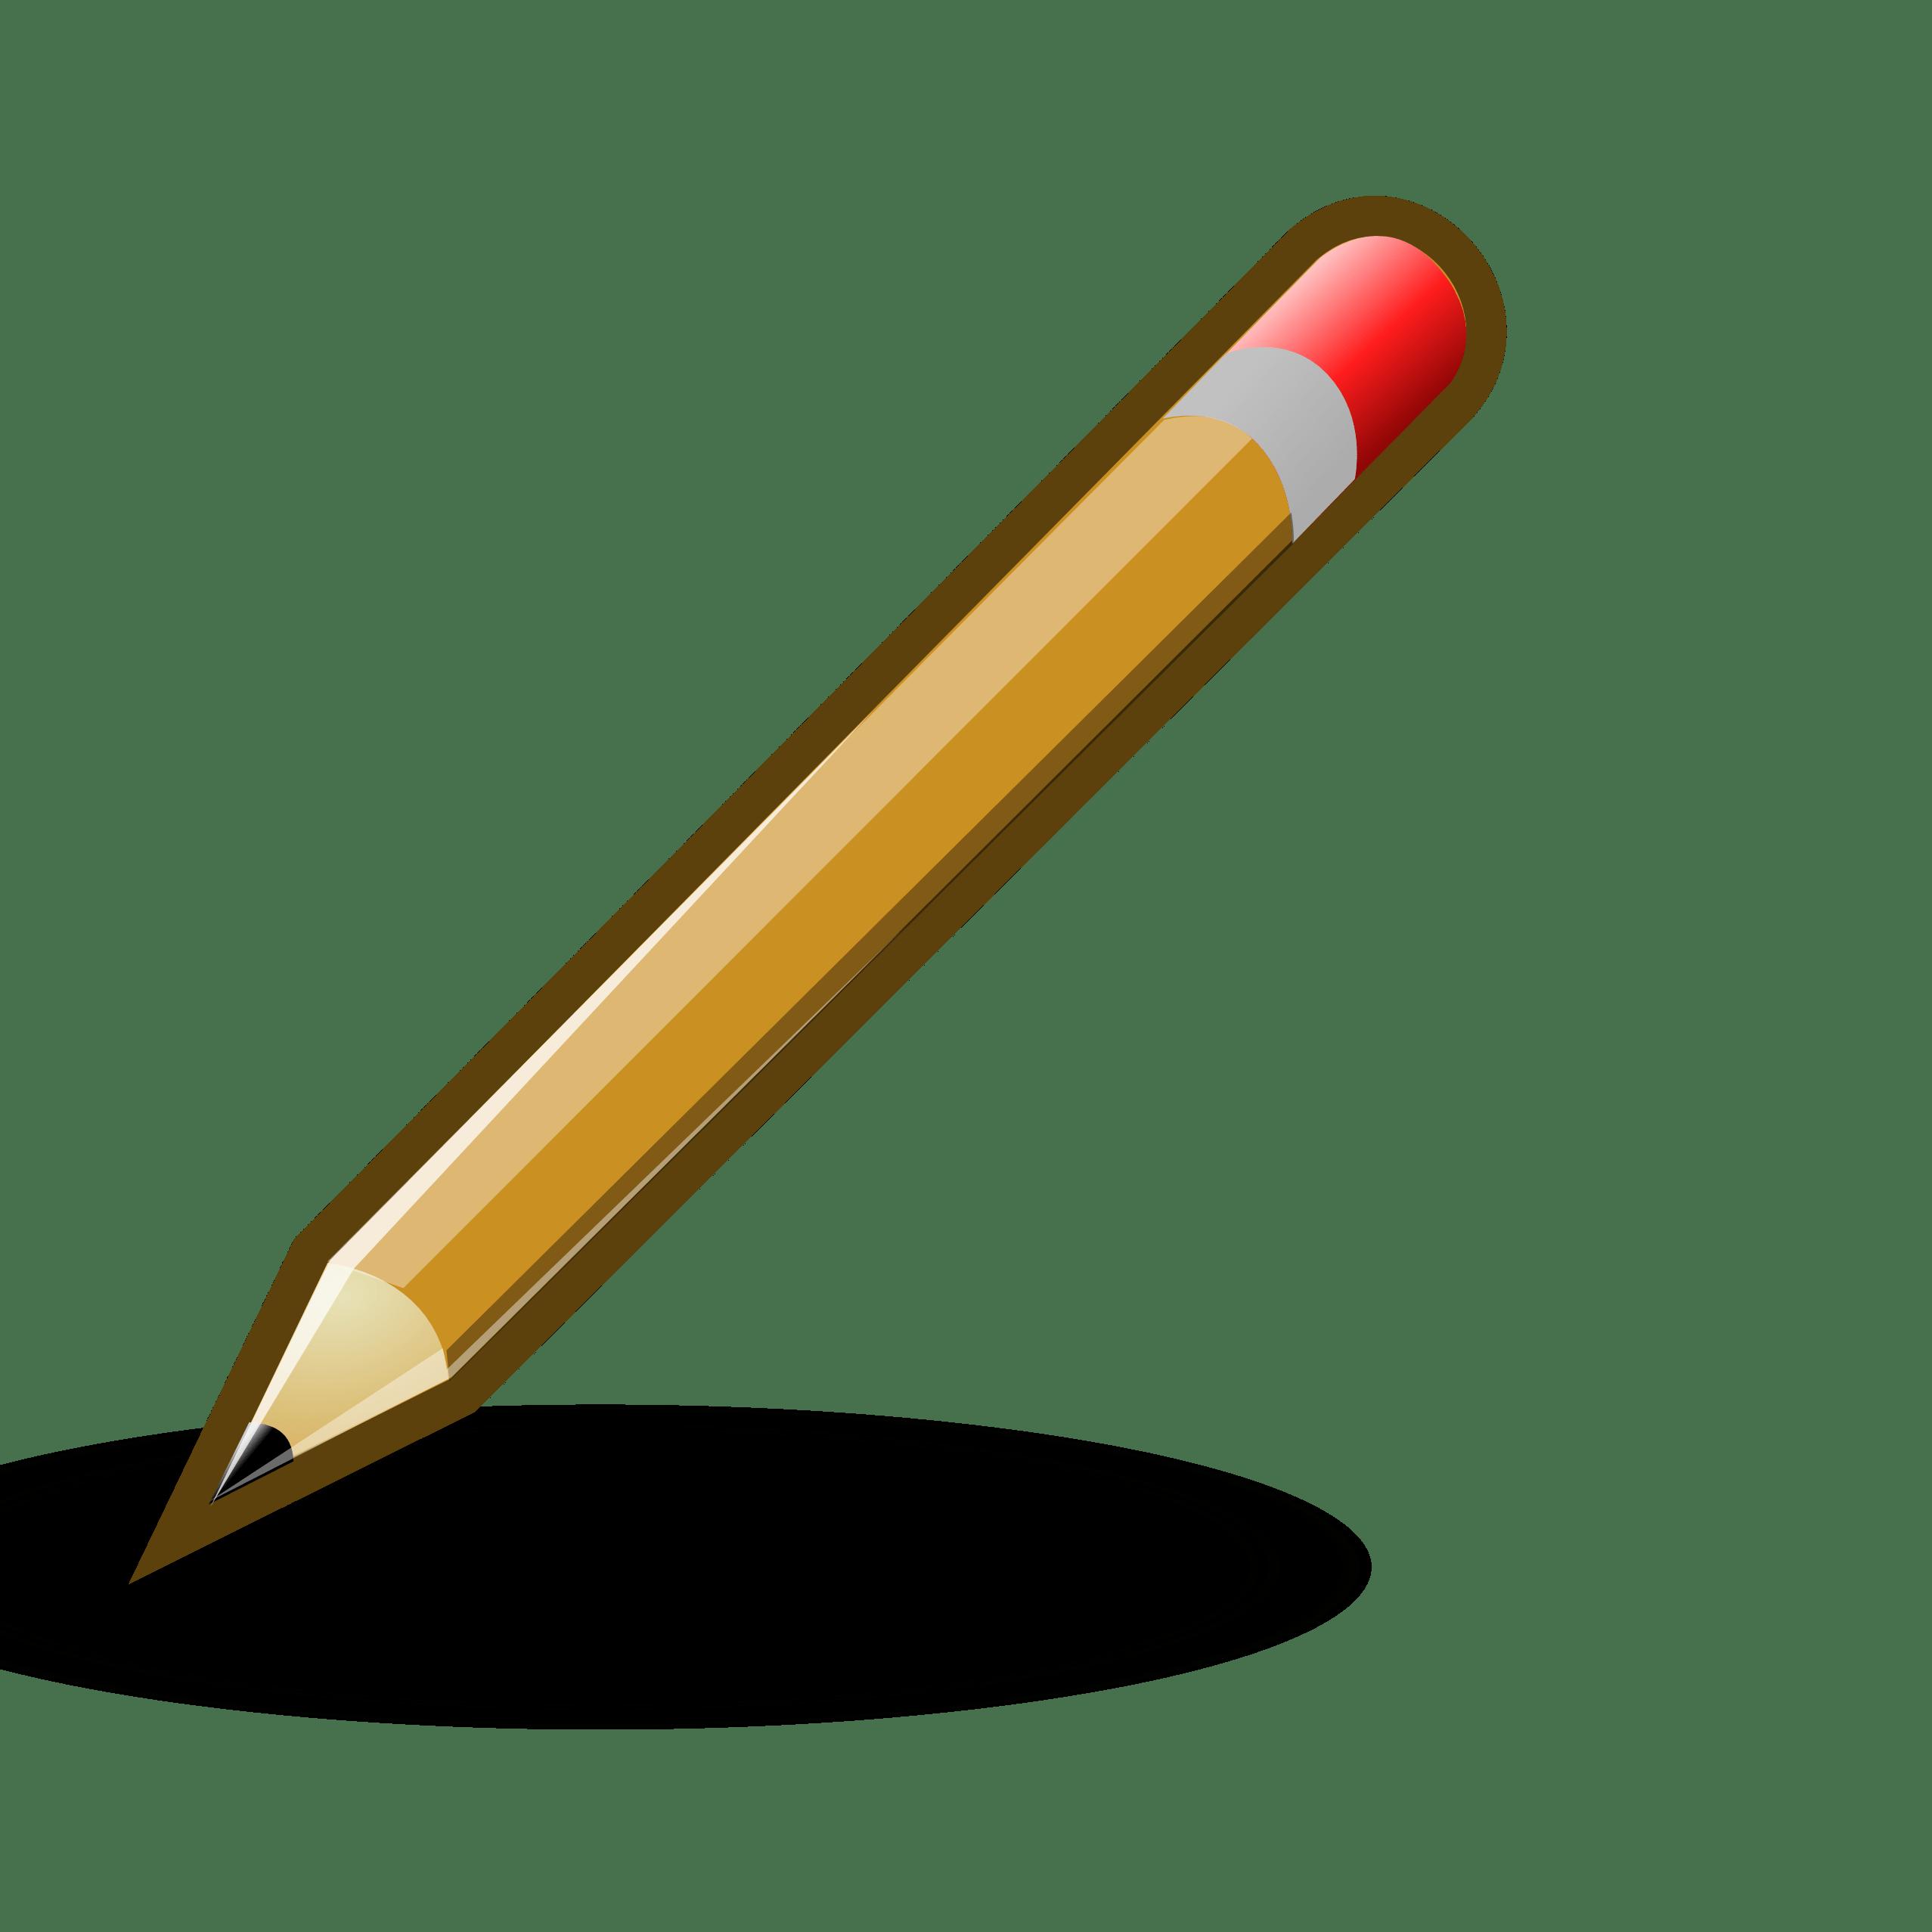 Pencil Drawing Clipart transparent PNG.